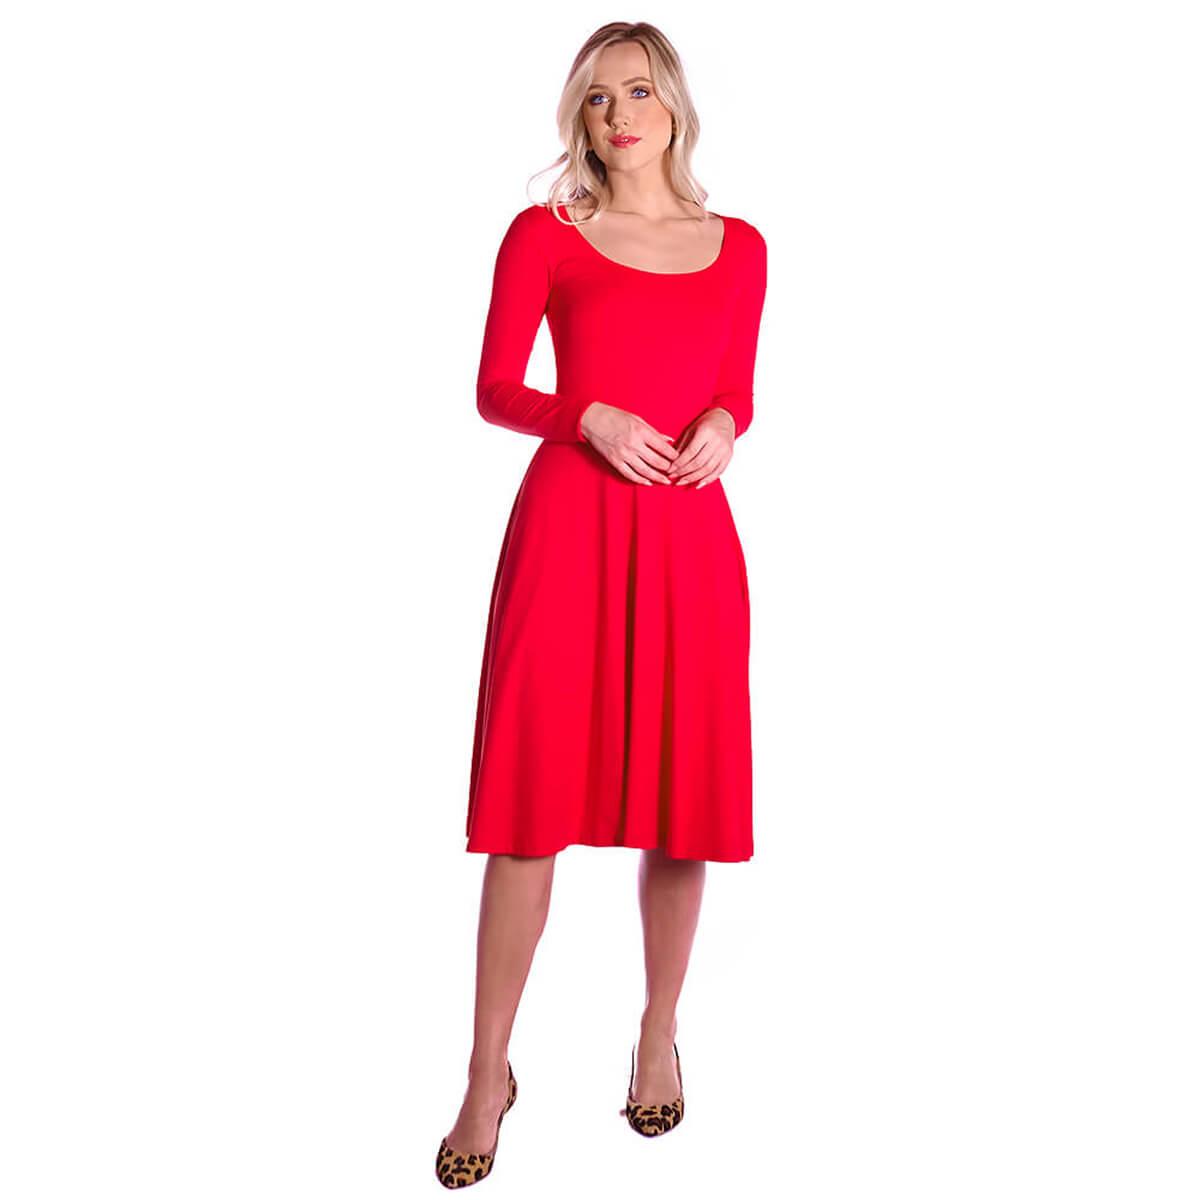 Vestido Vermelho Manga Longa Decote Redondo